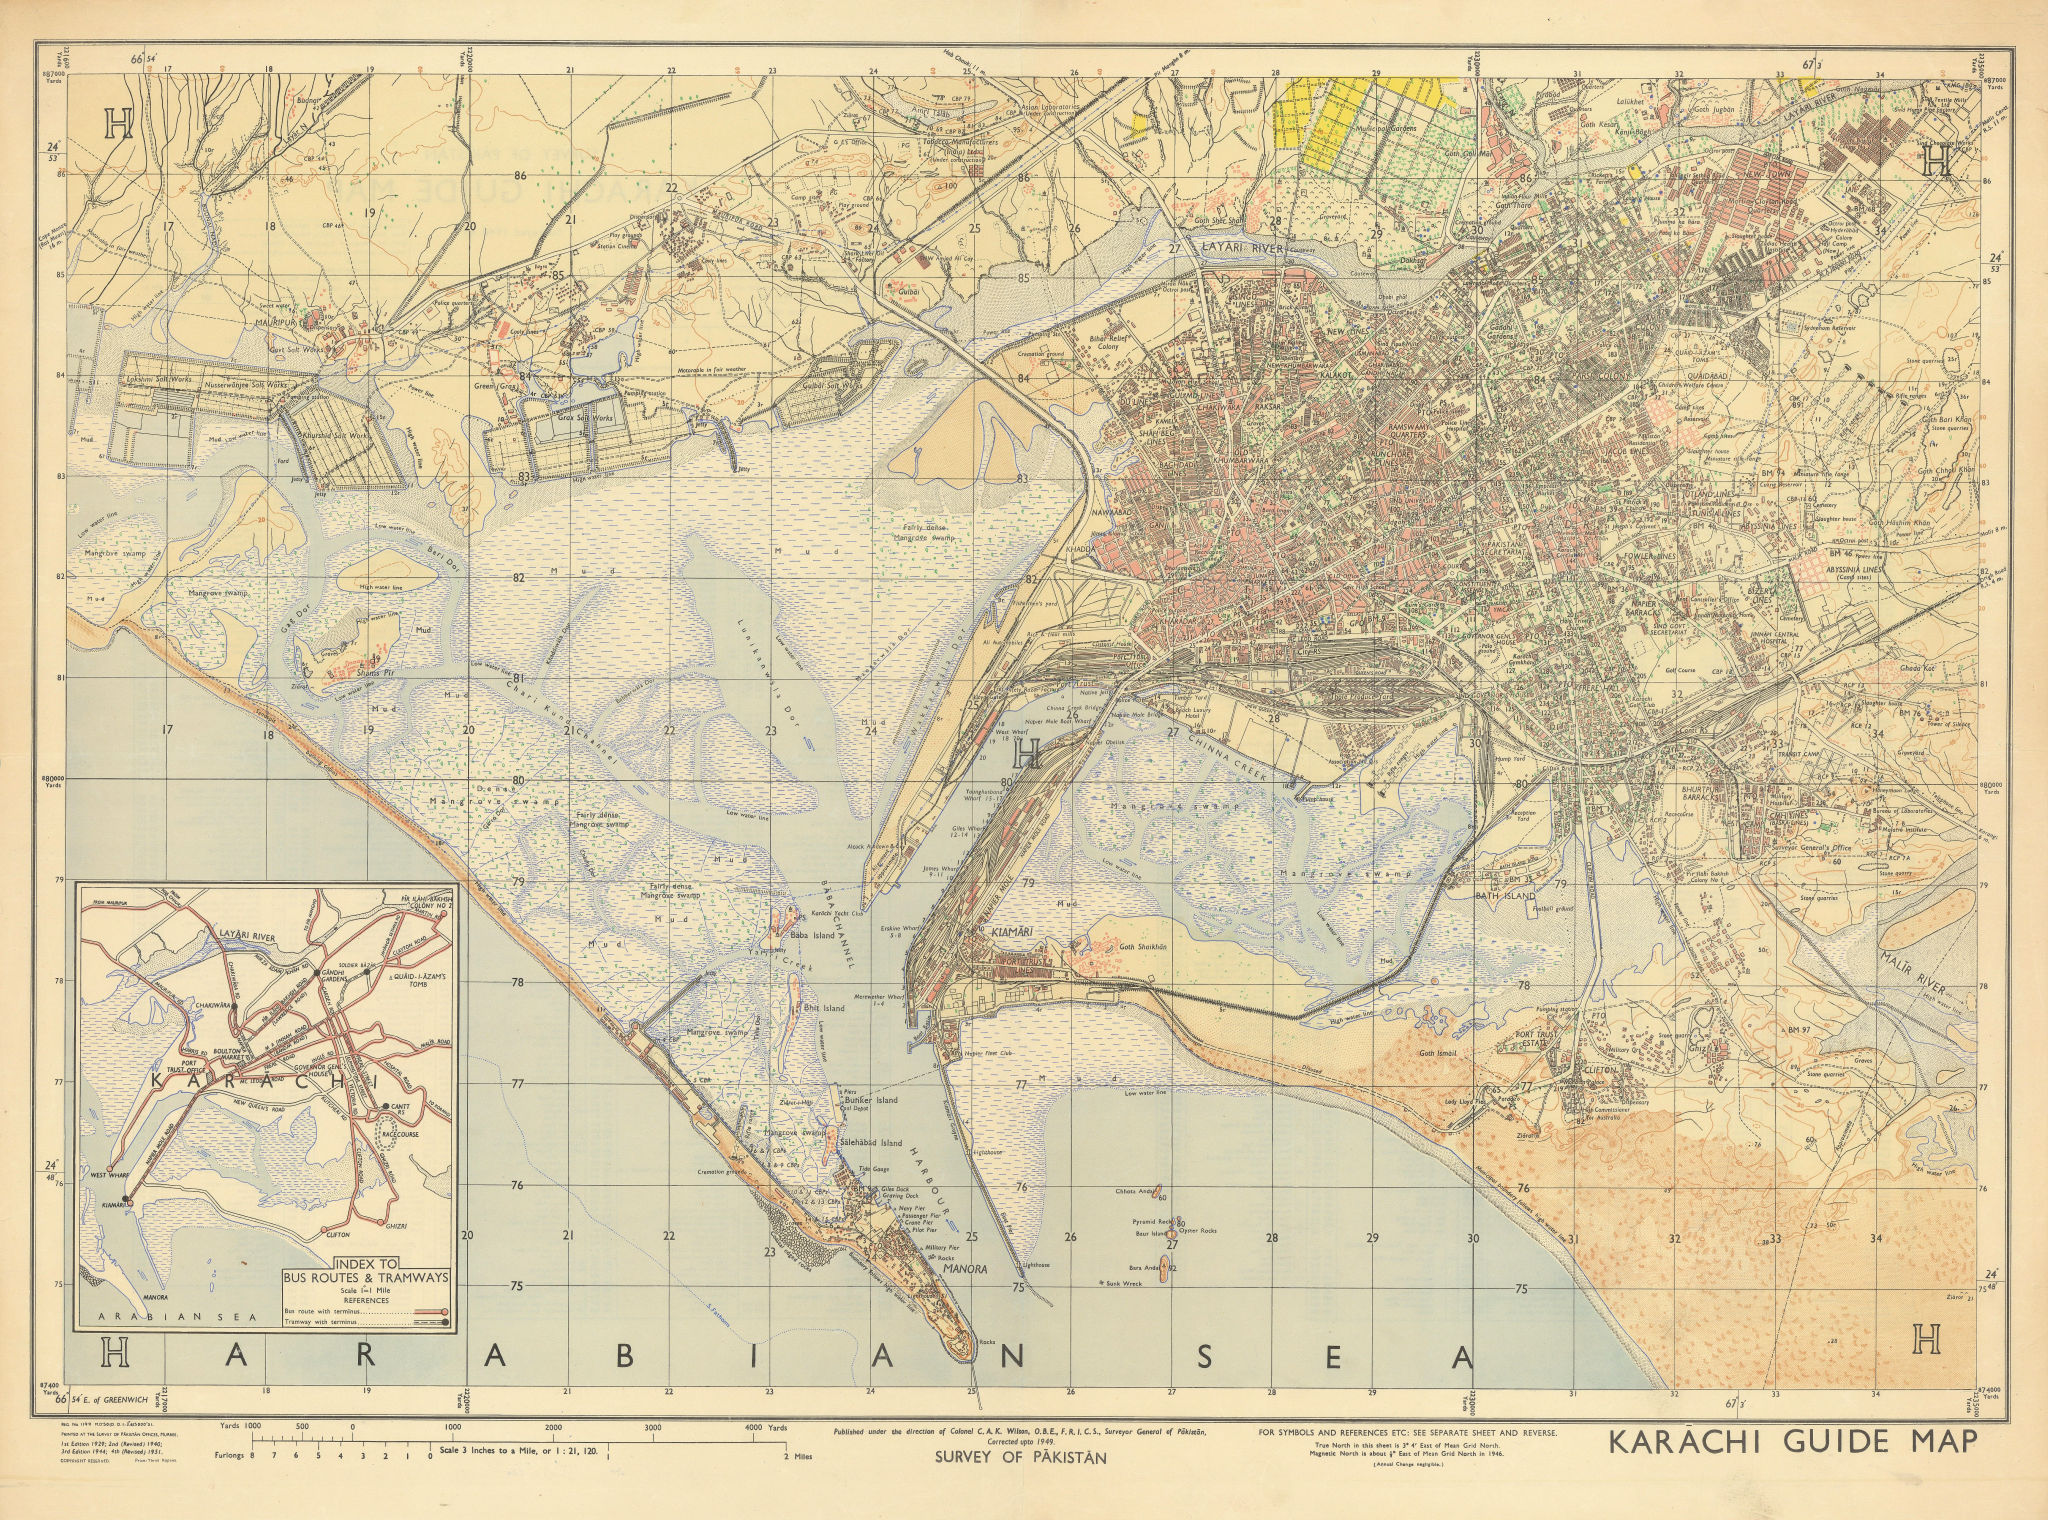 Karachi Town city plan. Survey of Pakistan 1951 old vintage map chart